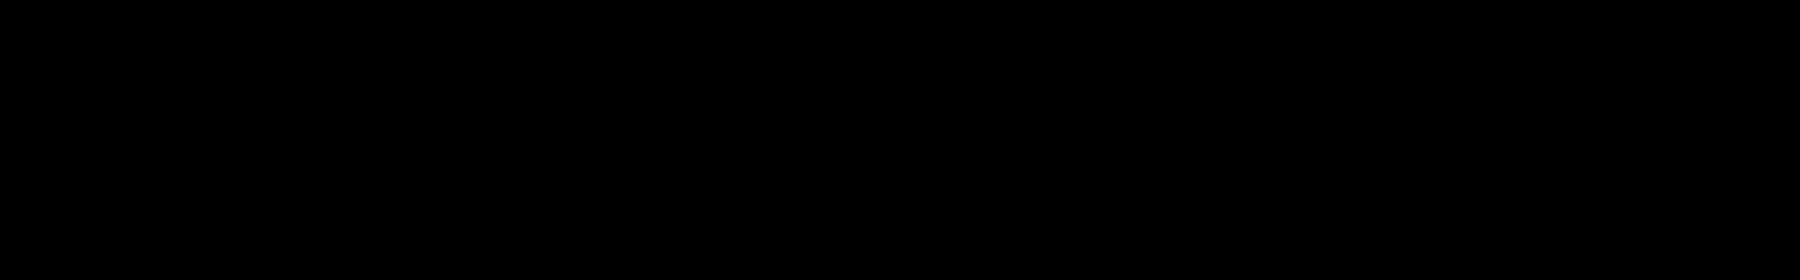 Elysian - Serum Bank audio waveform